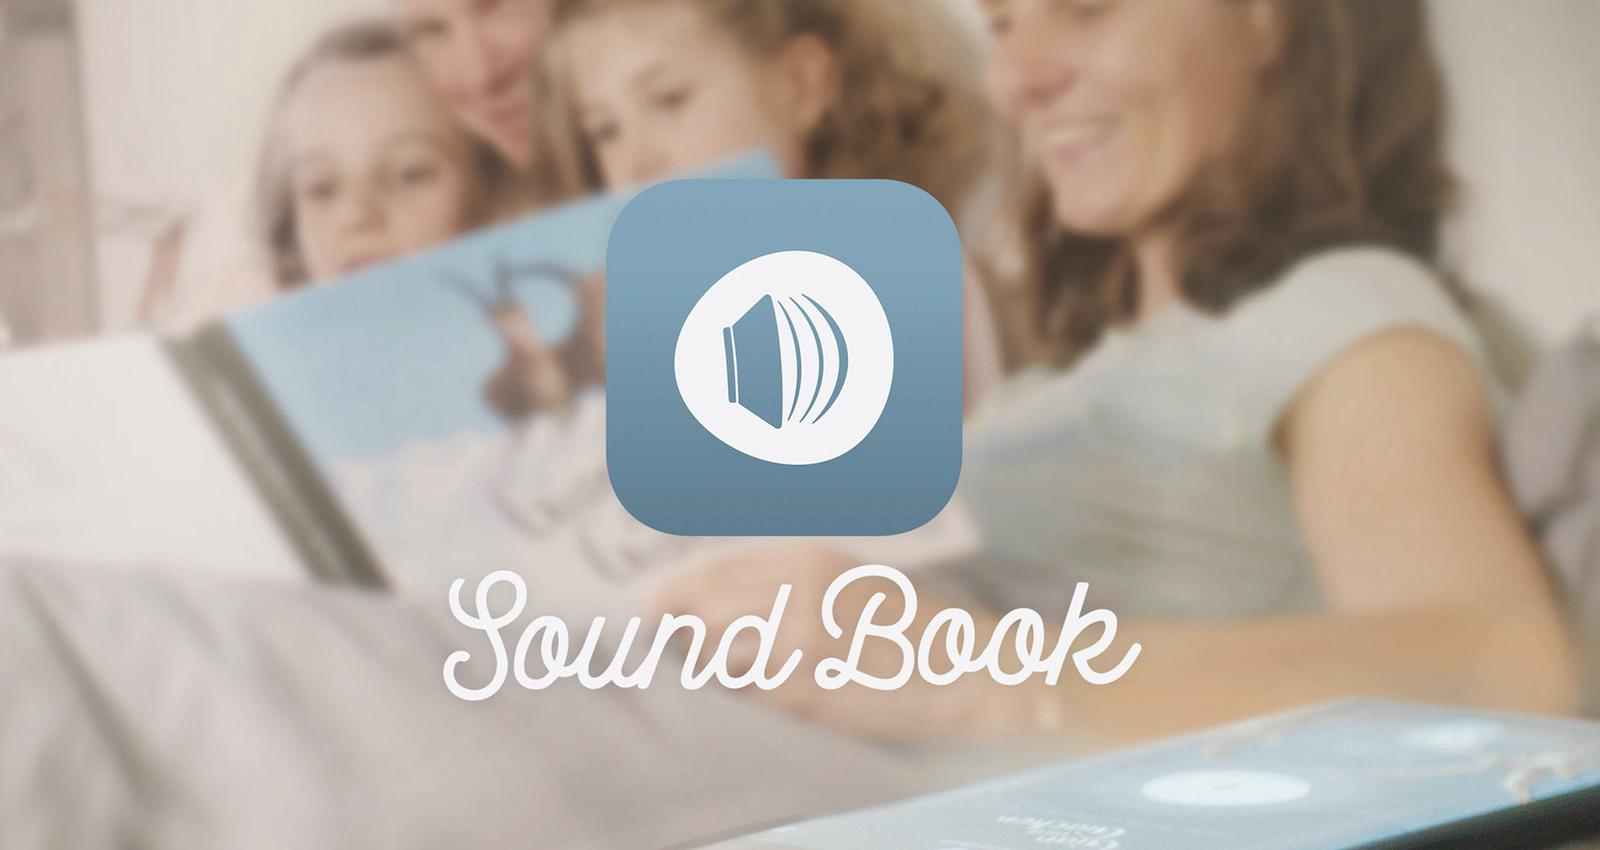 The Soundbook App